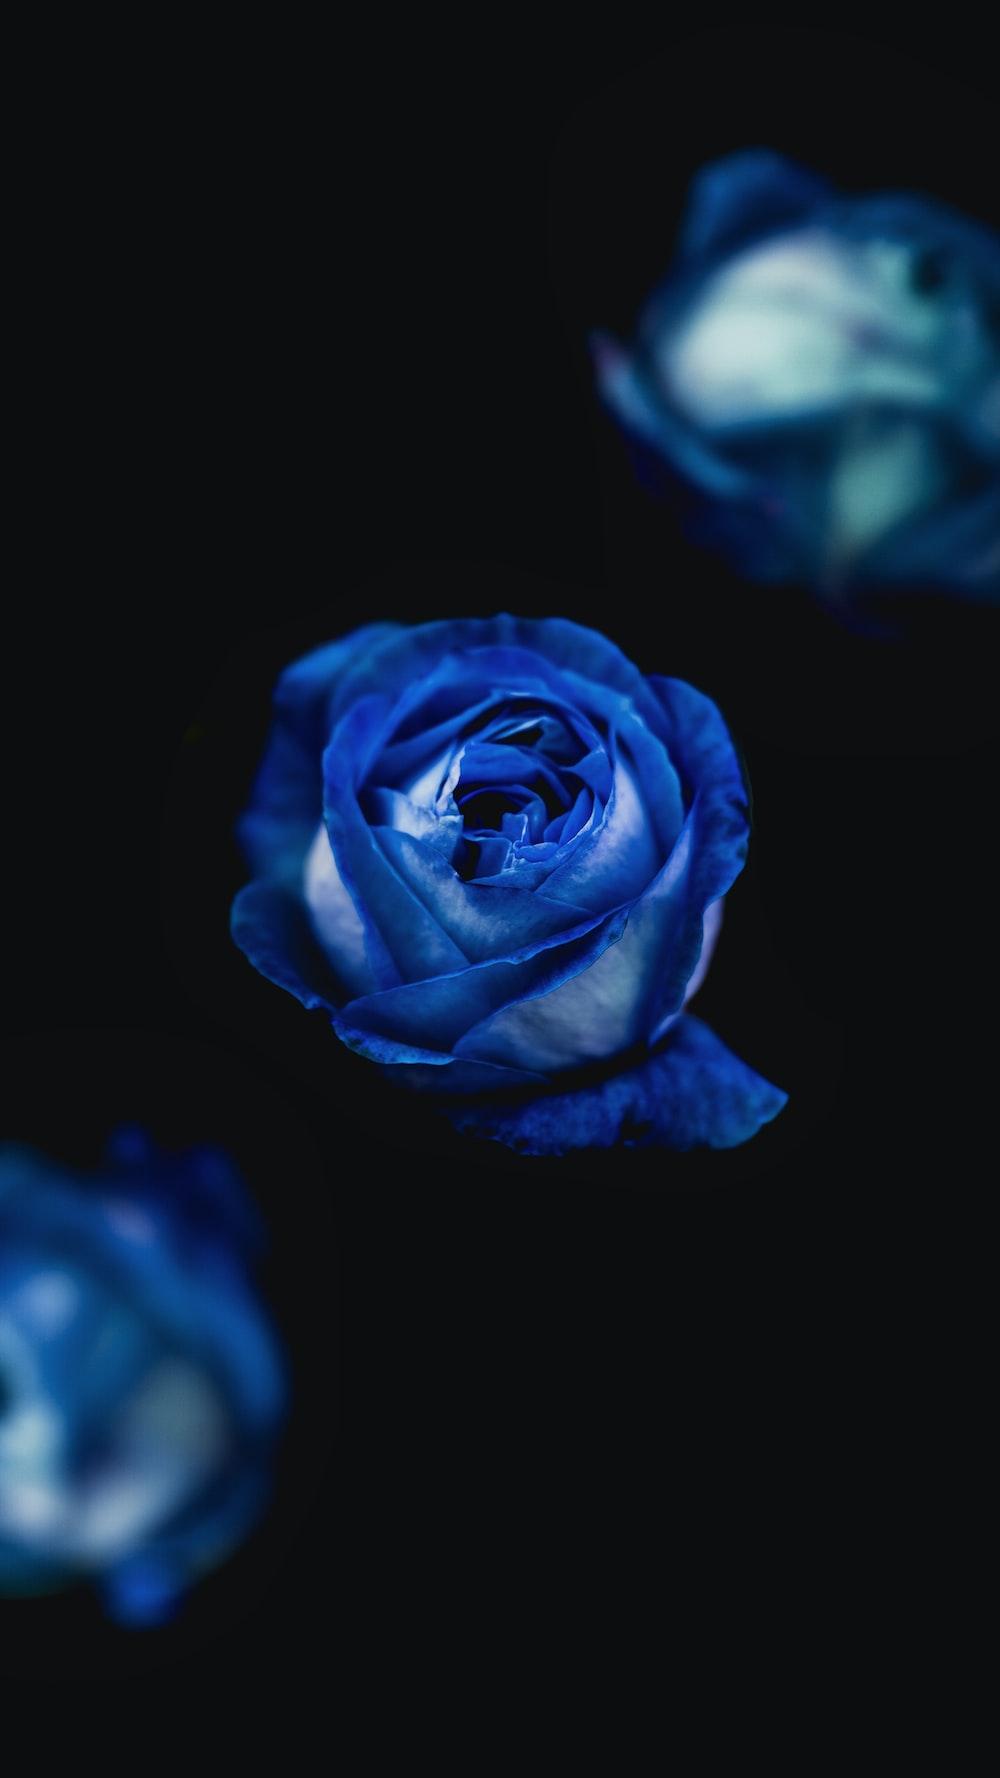 Blue Roses Hd Photo By Alexandru Acea At Alexacea On Unsplash